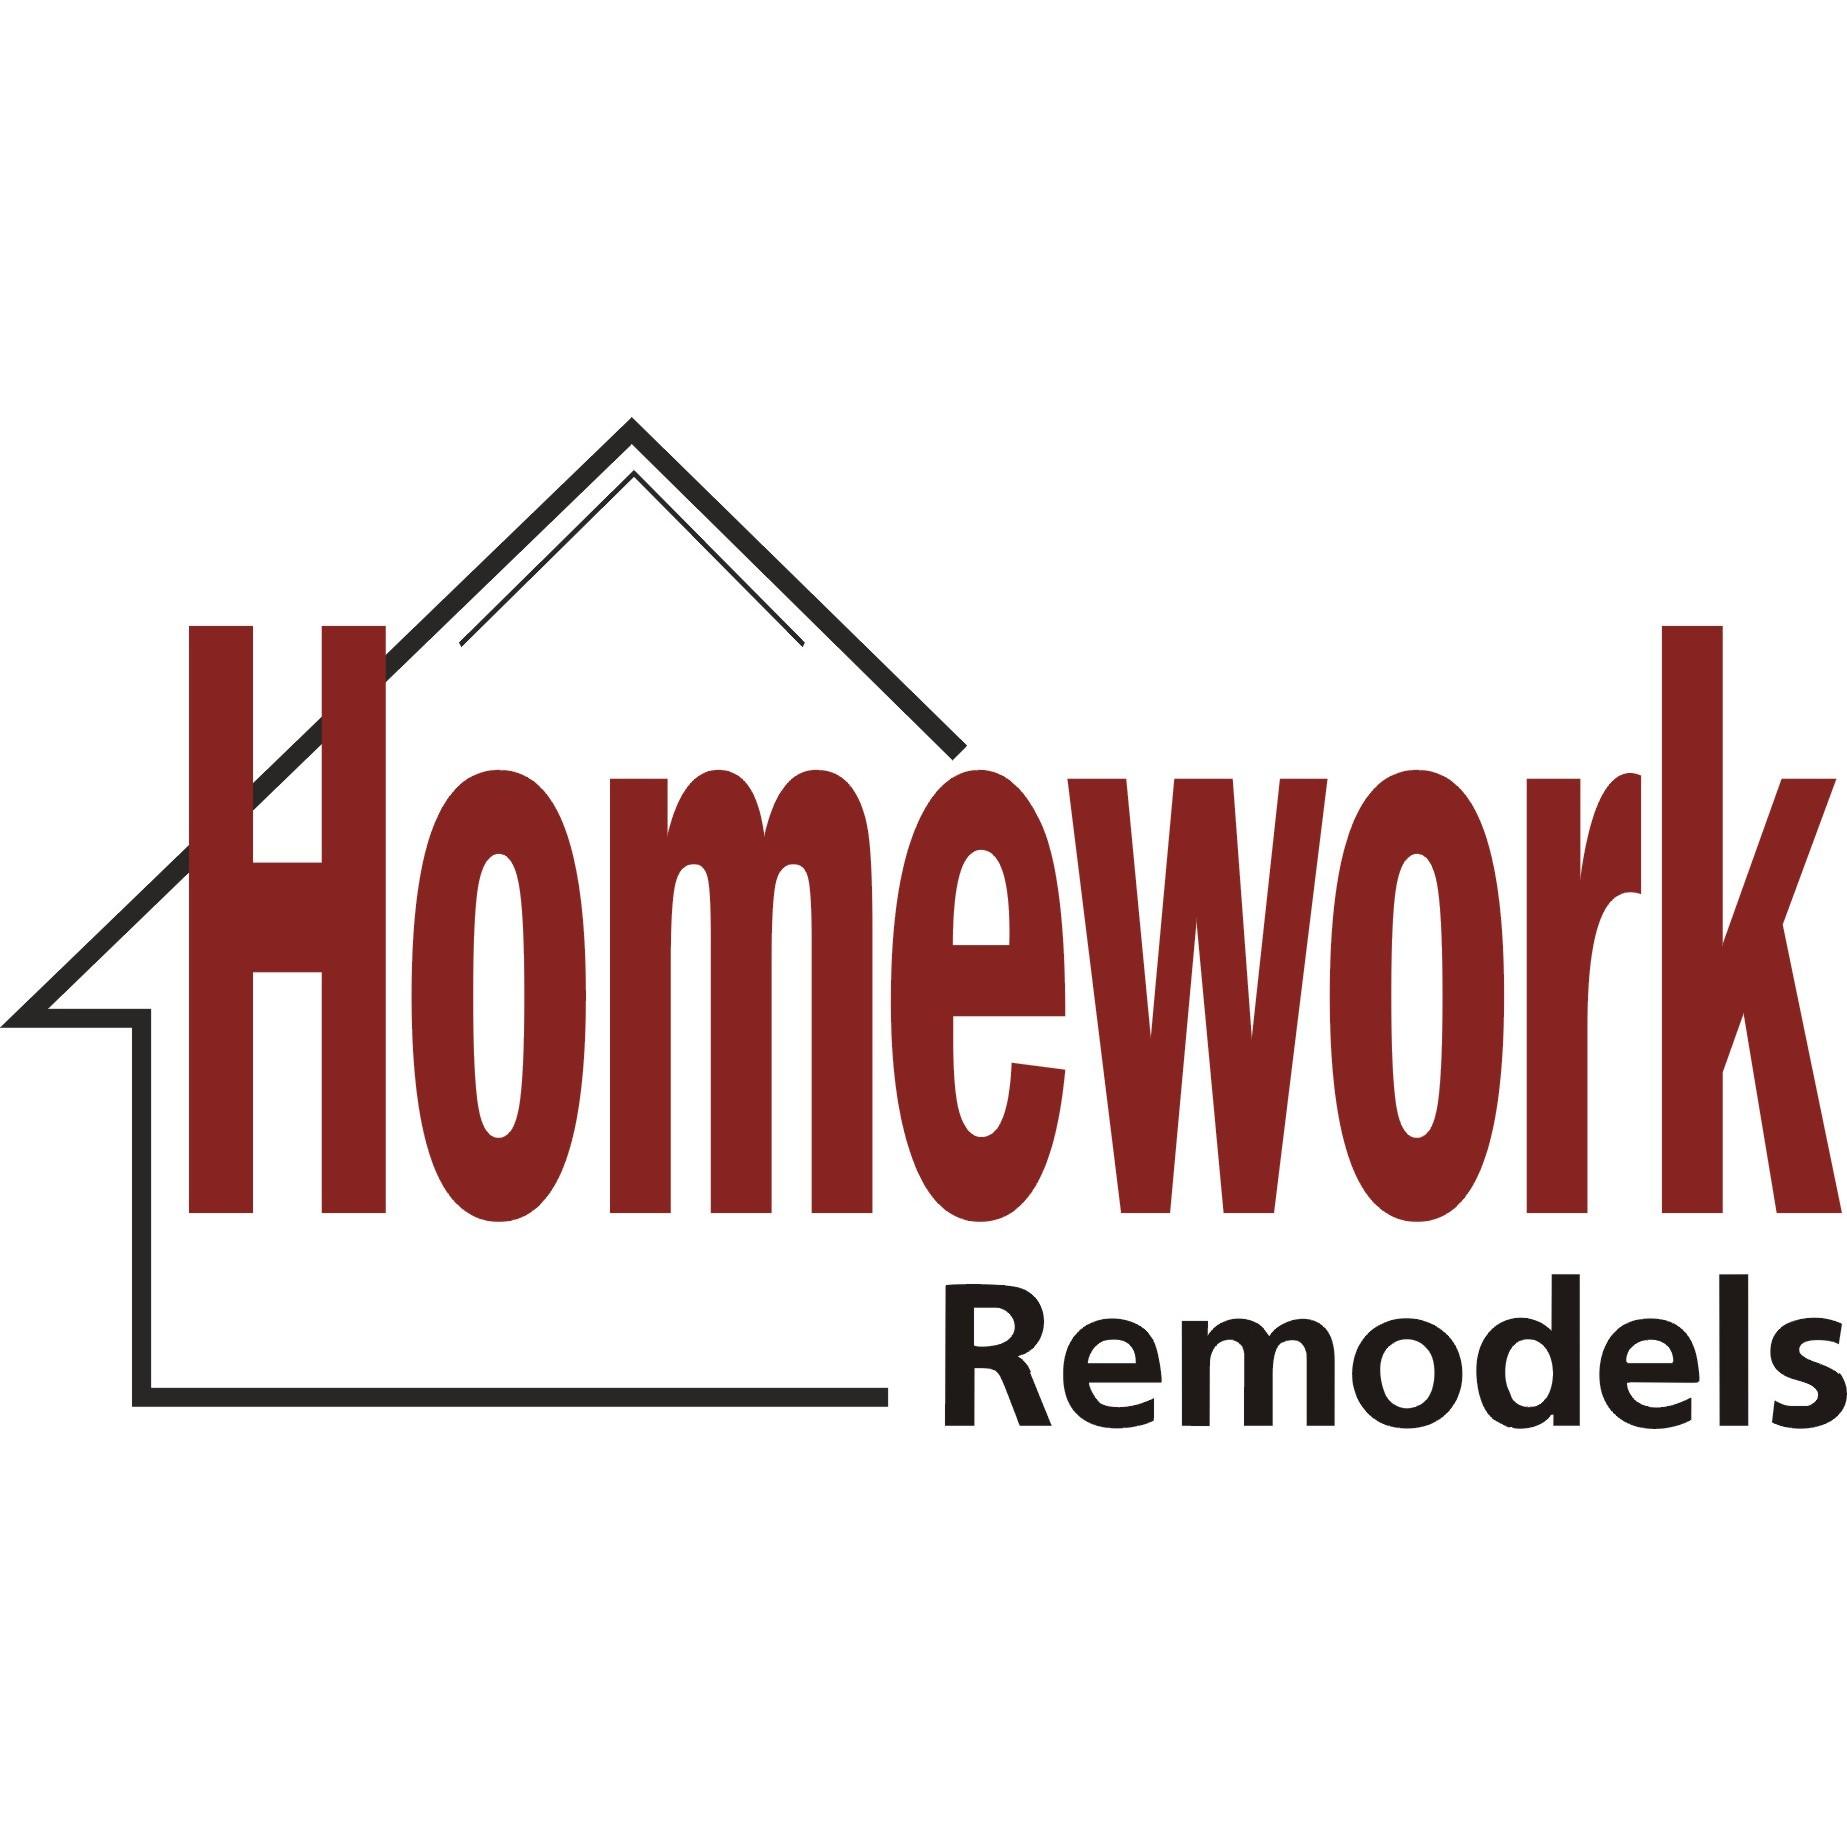 Homework Remodels